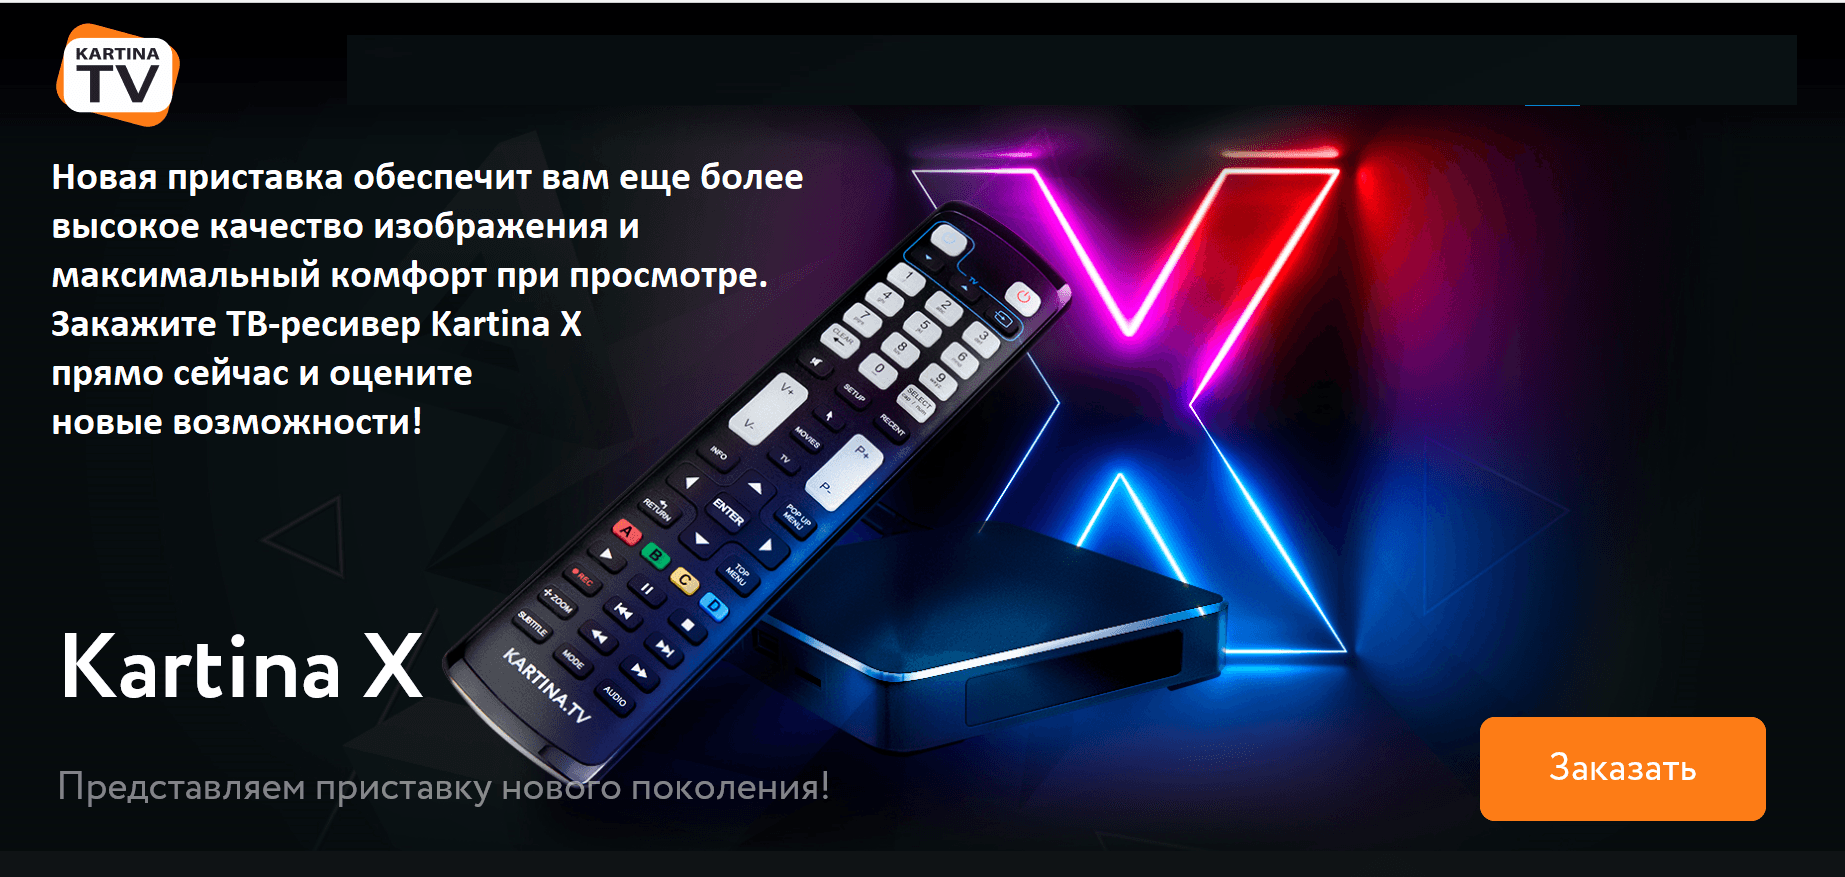 Kartina X IPTV 4K Receiver mit Wi-Fi NEU